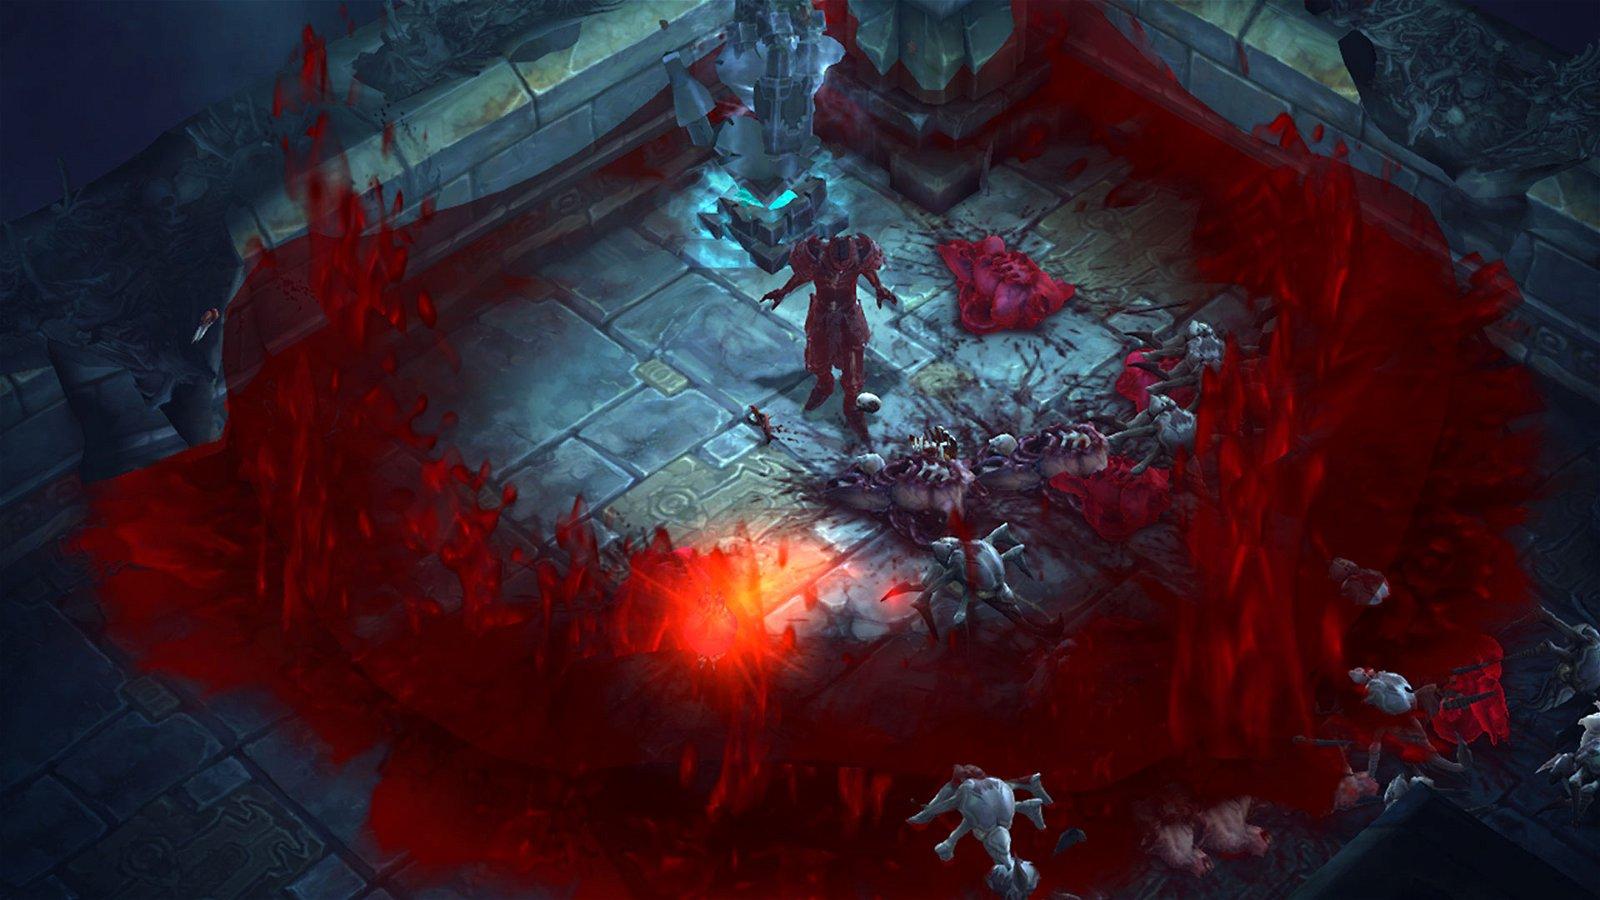 Diablo Iii: Rise Of The Necromancer Review - Nostalgia Done Right 1